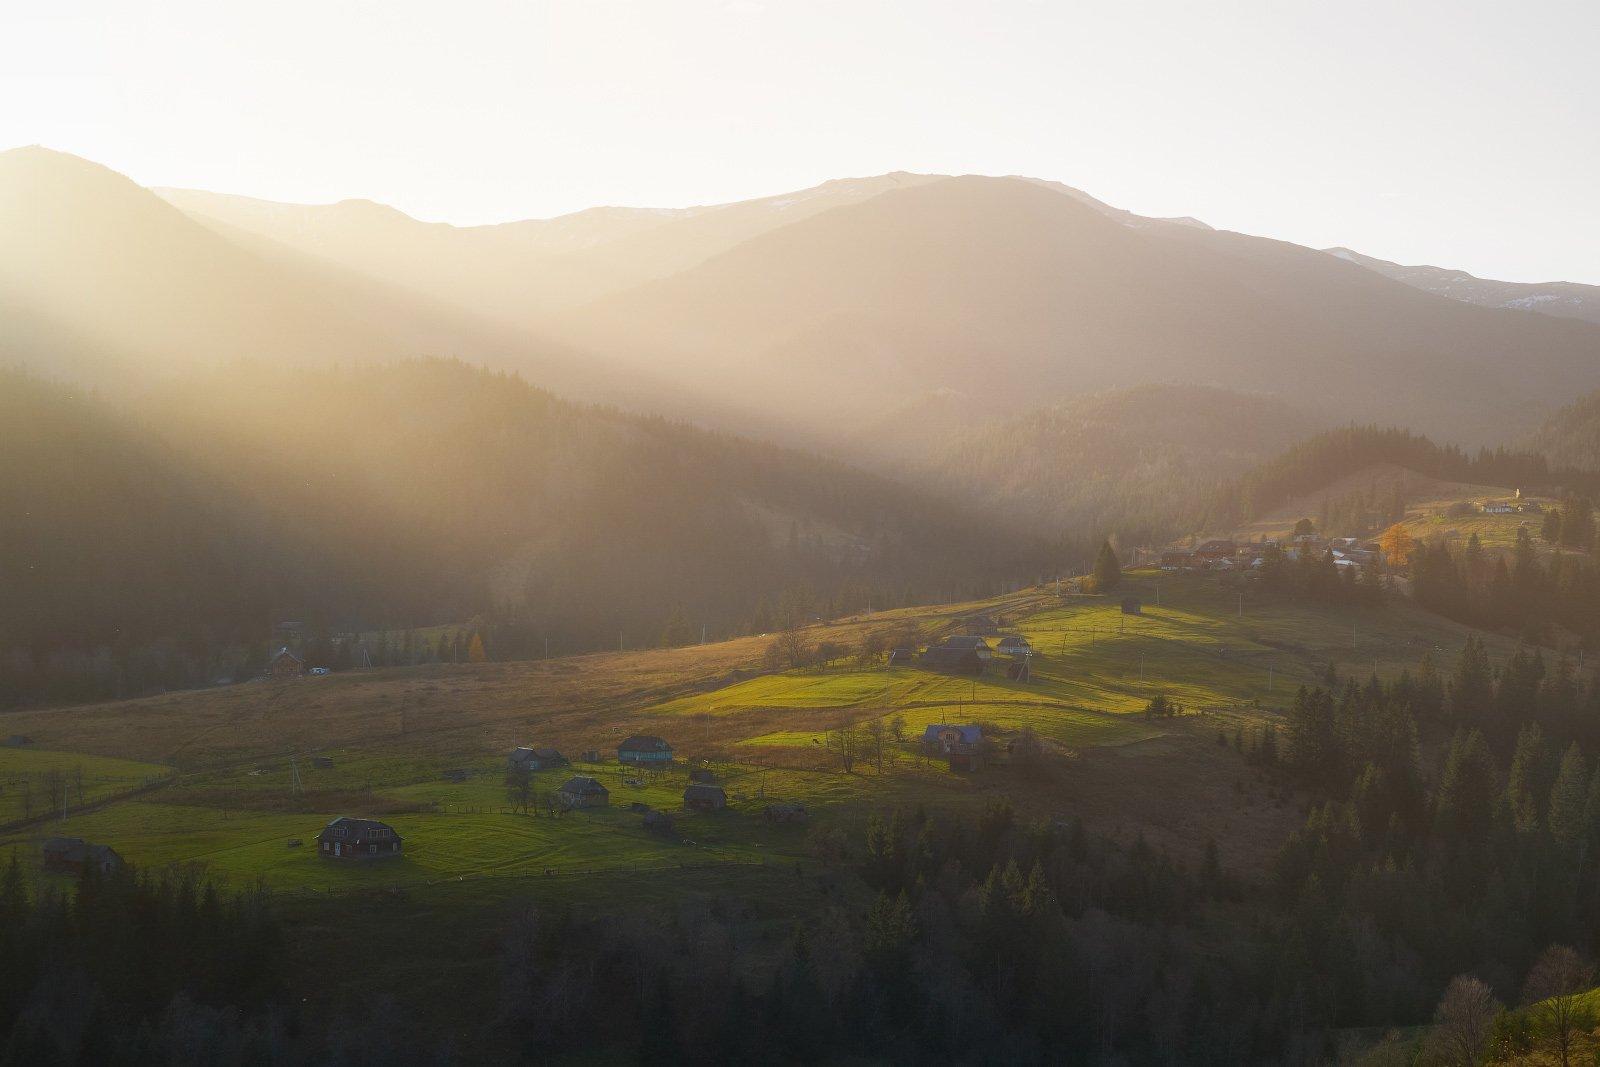 #landscape #nature #scenery #forest #wood #autumn #mist #misty #fog #foggy #river #waterfall #longexposure #mountain #vitosha #bulgari #aтуман #лес #oсень, Морозов Леонид